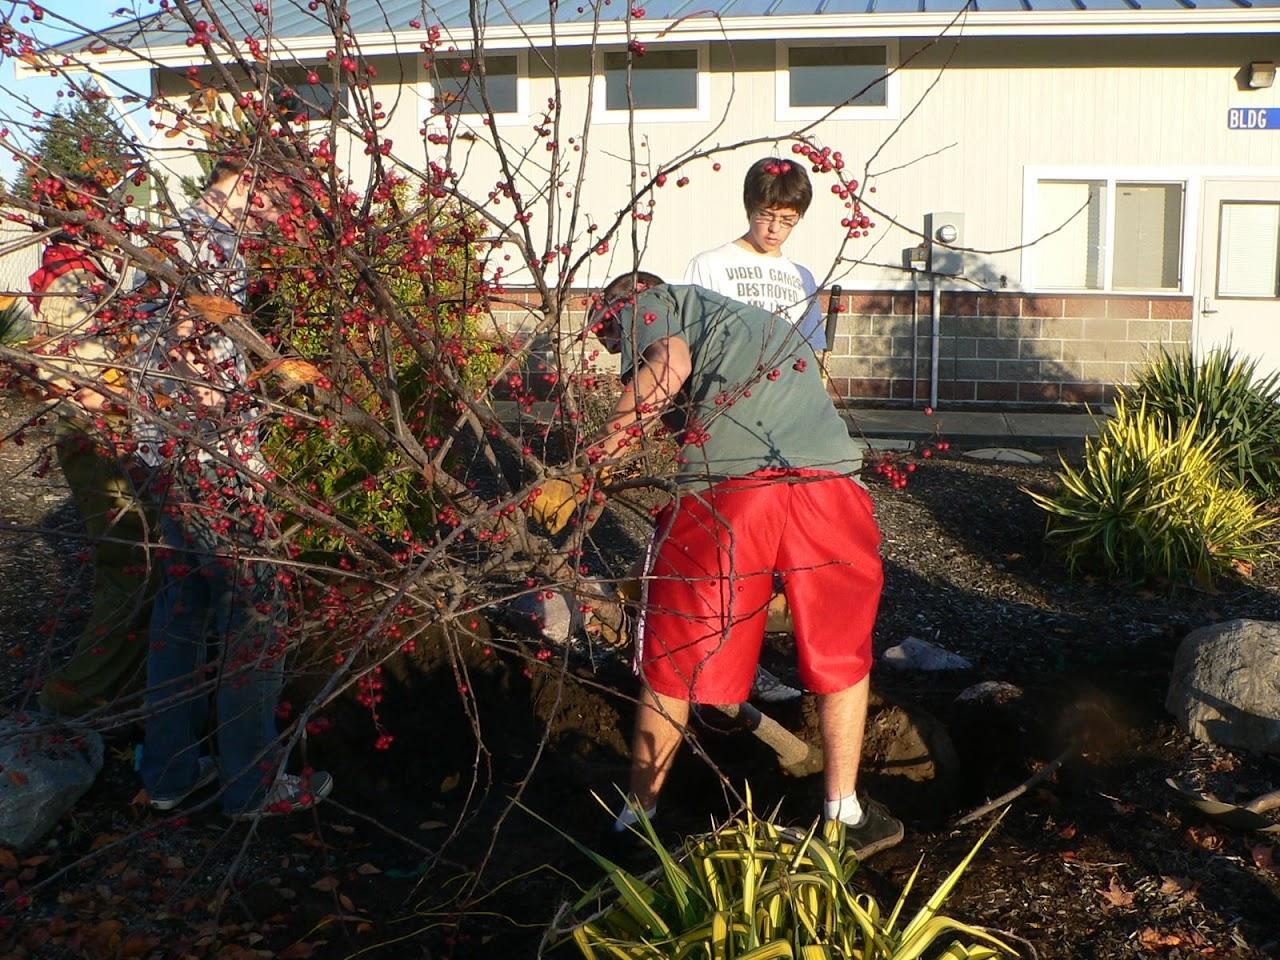 Tree Planting November 2010 - 110410 021.JPG